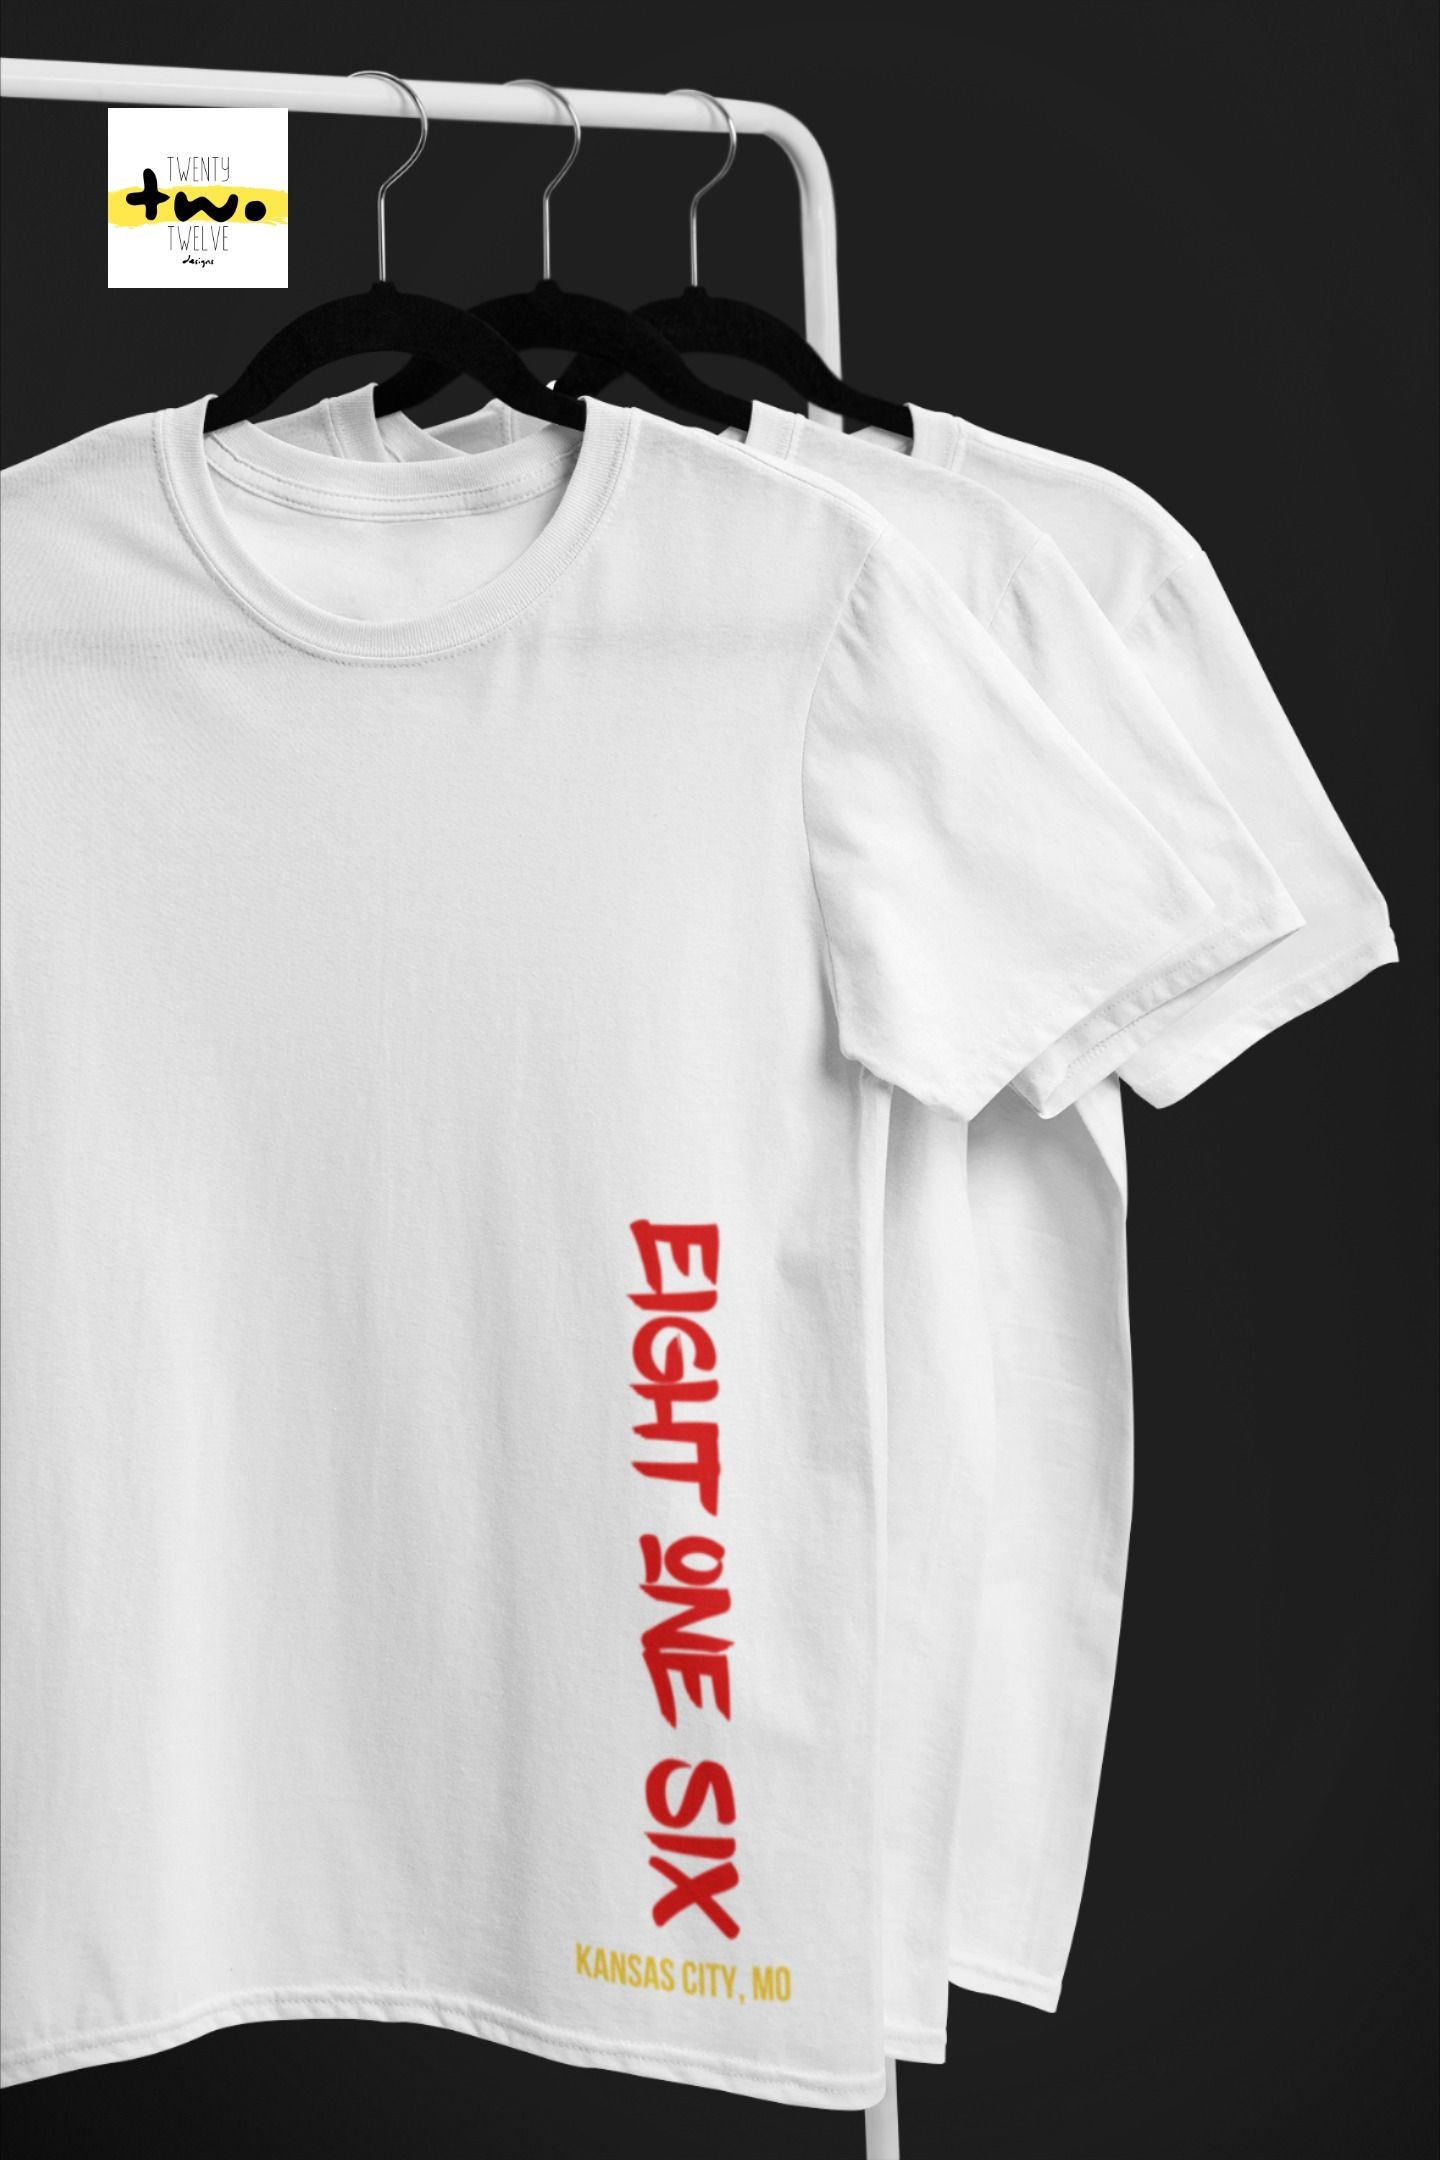 Chiefs Area Code Shirt, Kansas City Missouri Area Code